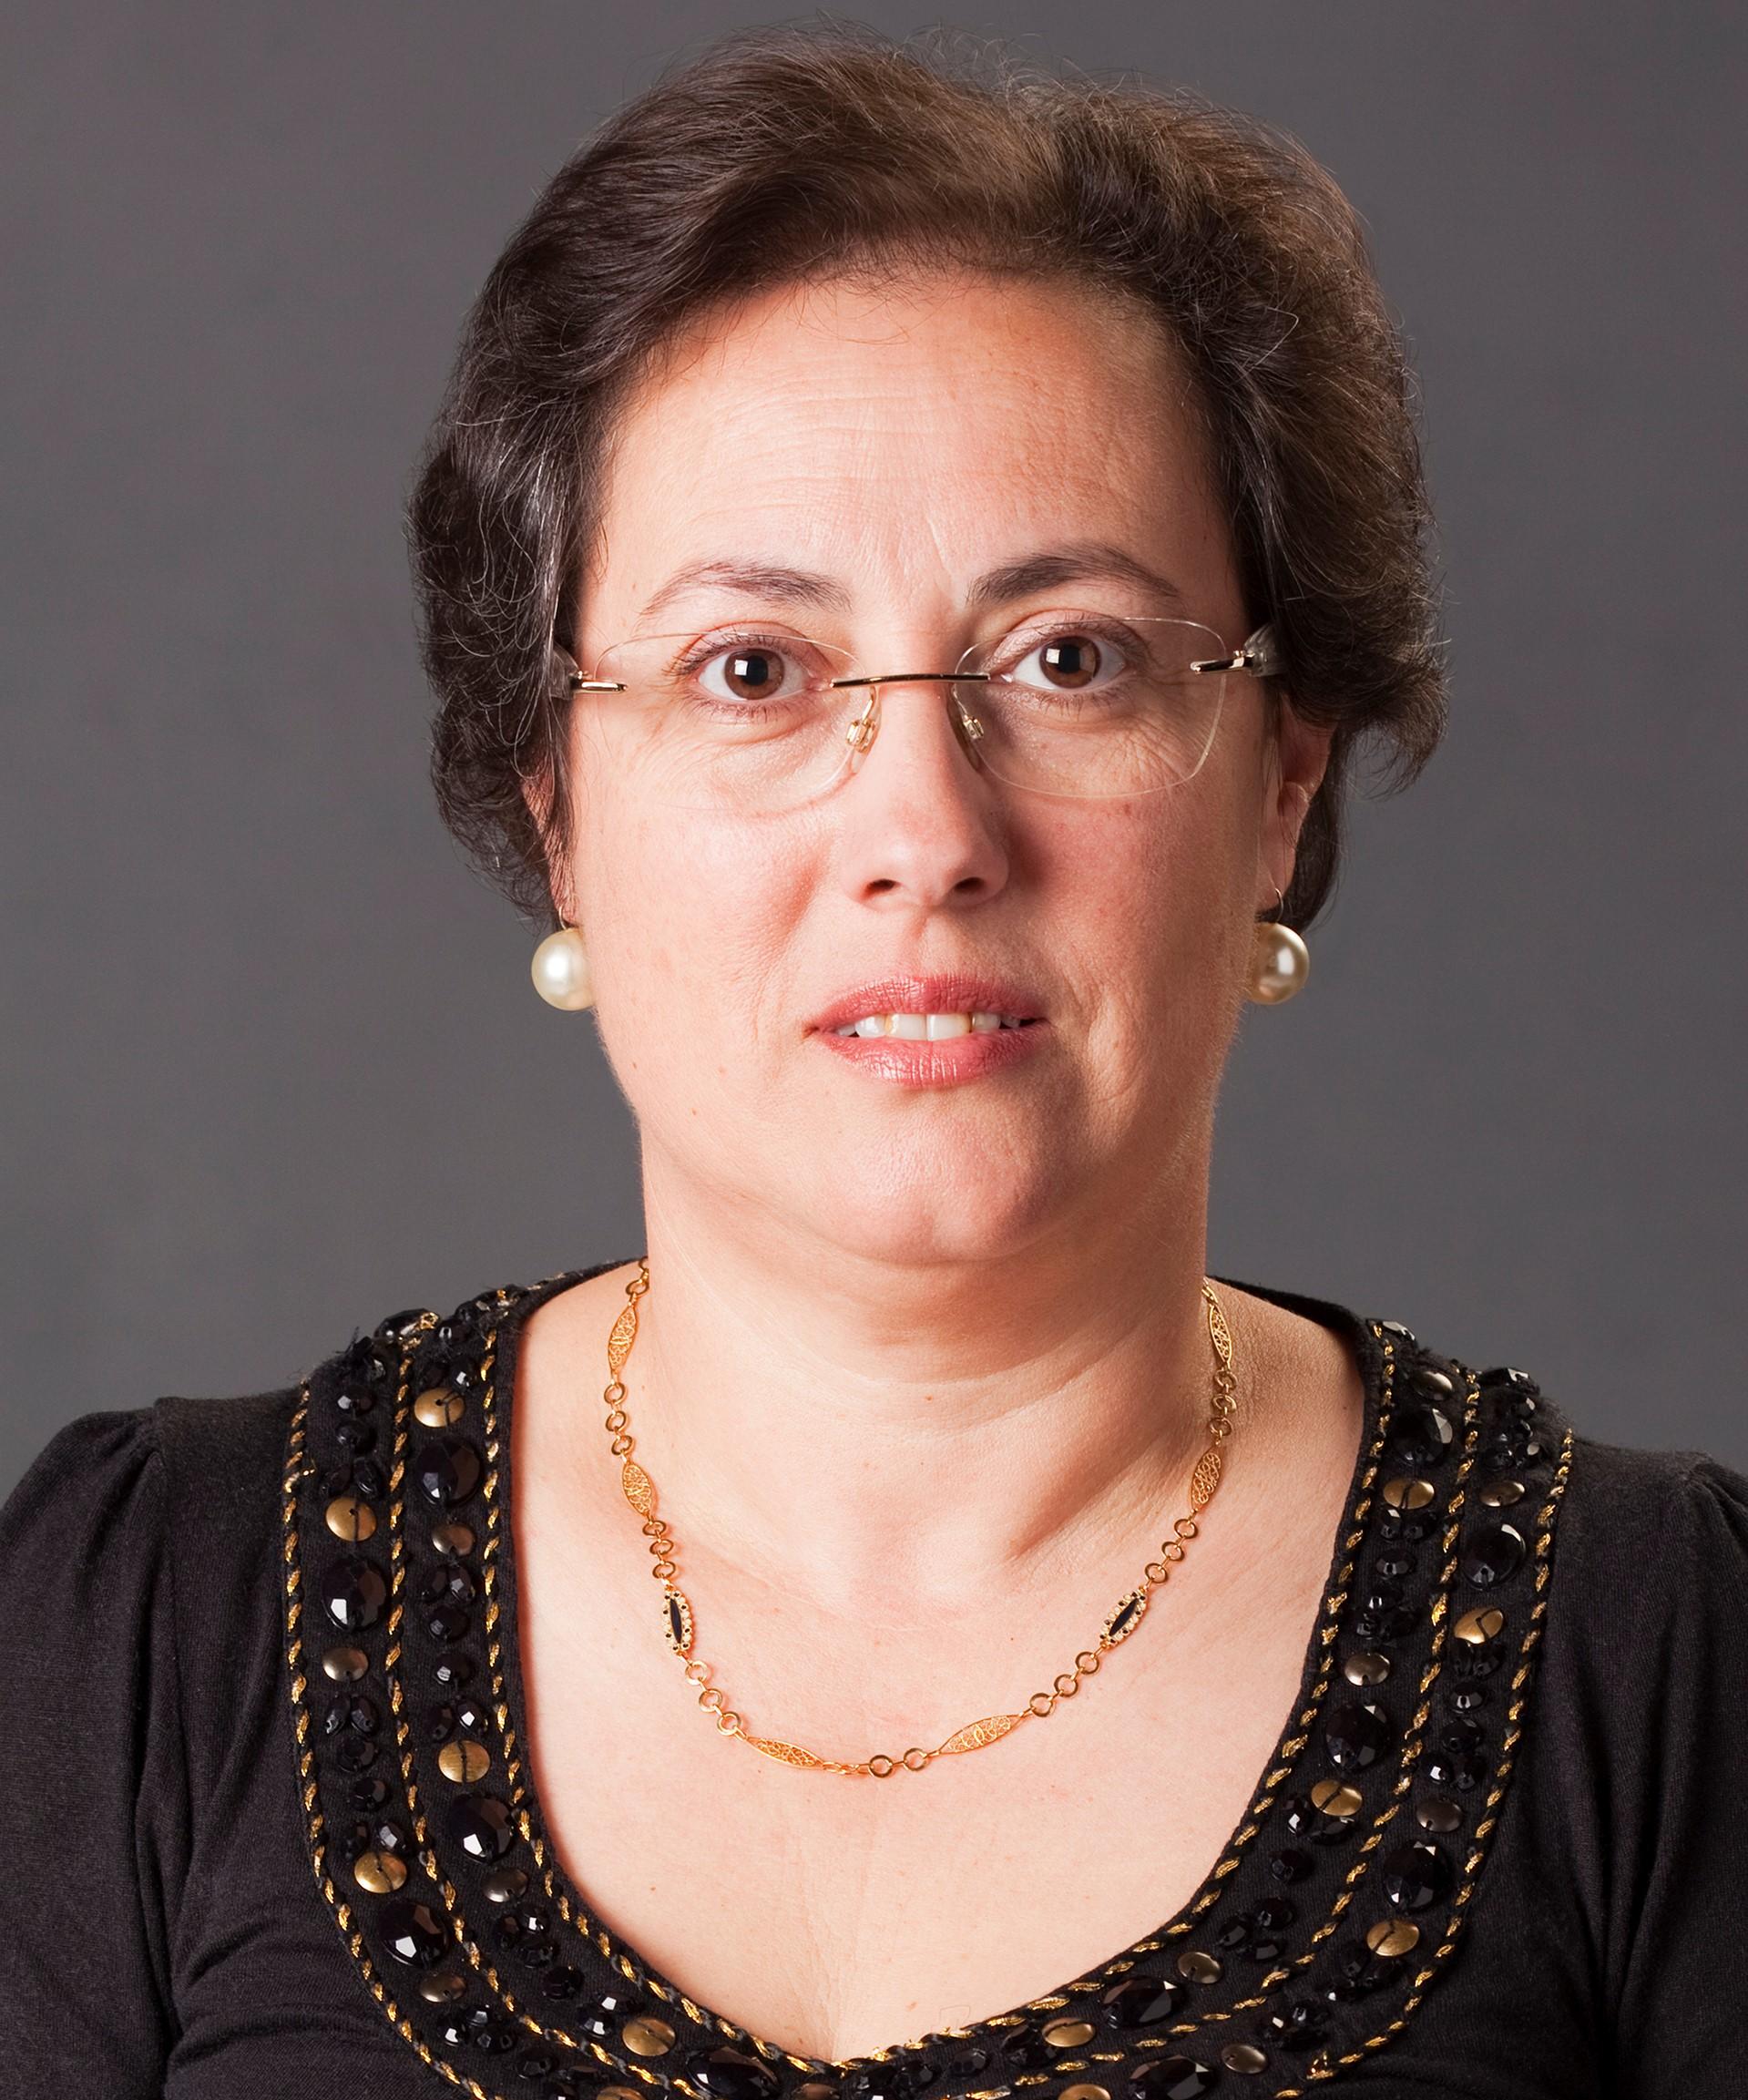 Cecília de Melo Correia Baptista